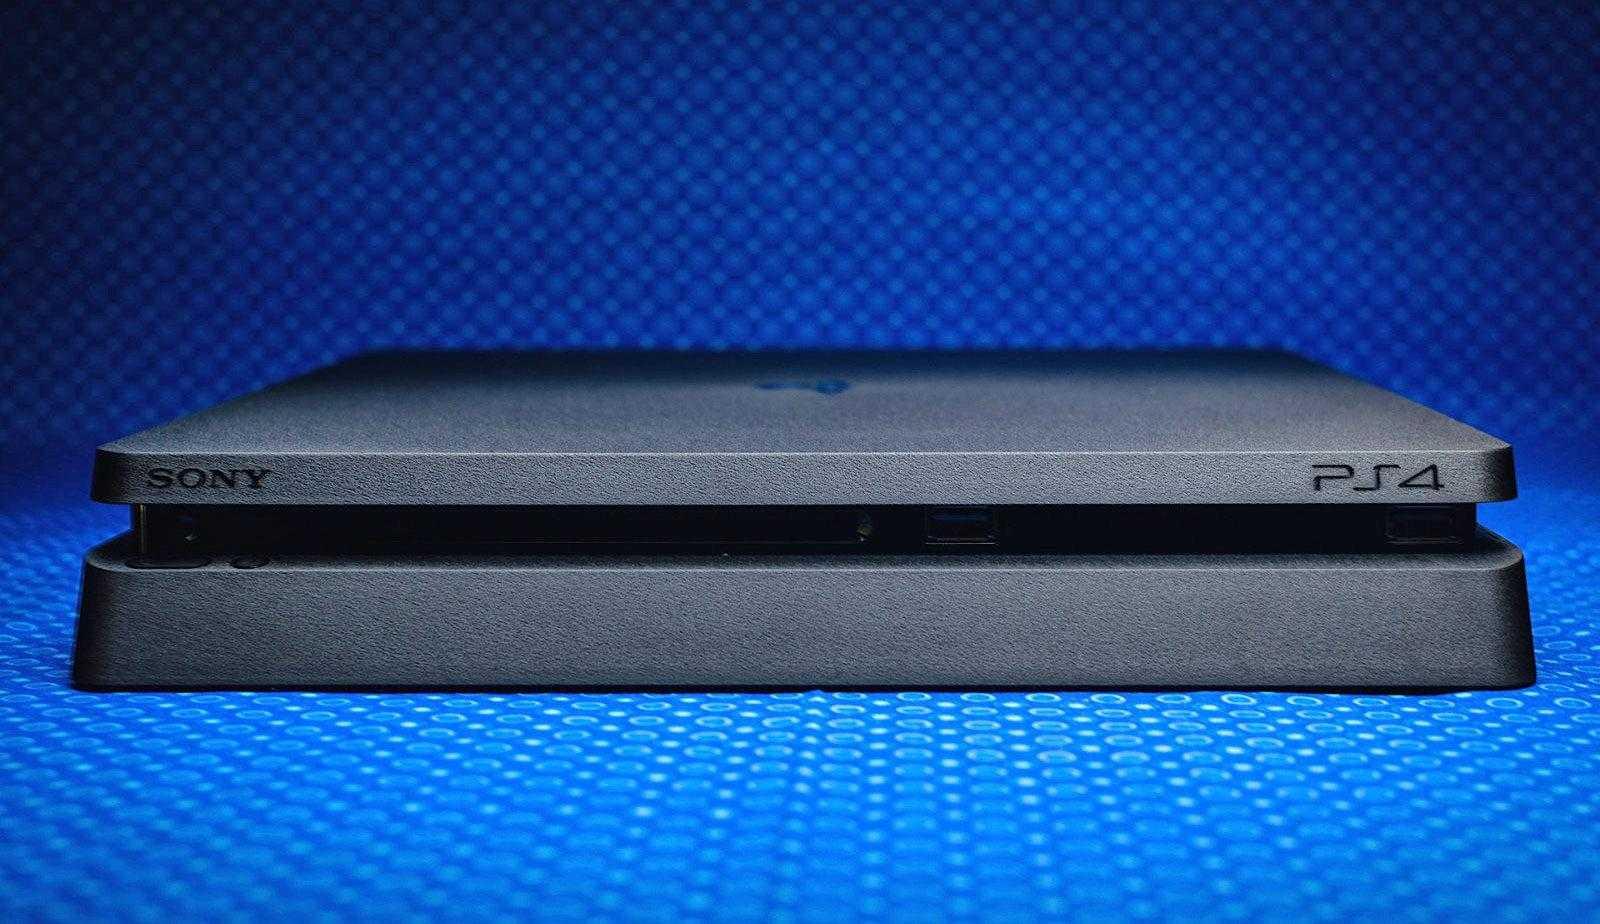 Меньше – не значит хуже. Обзор Sony Playstation 4 Slim (anniversary 6 ed e1475088977995)